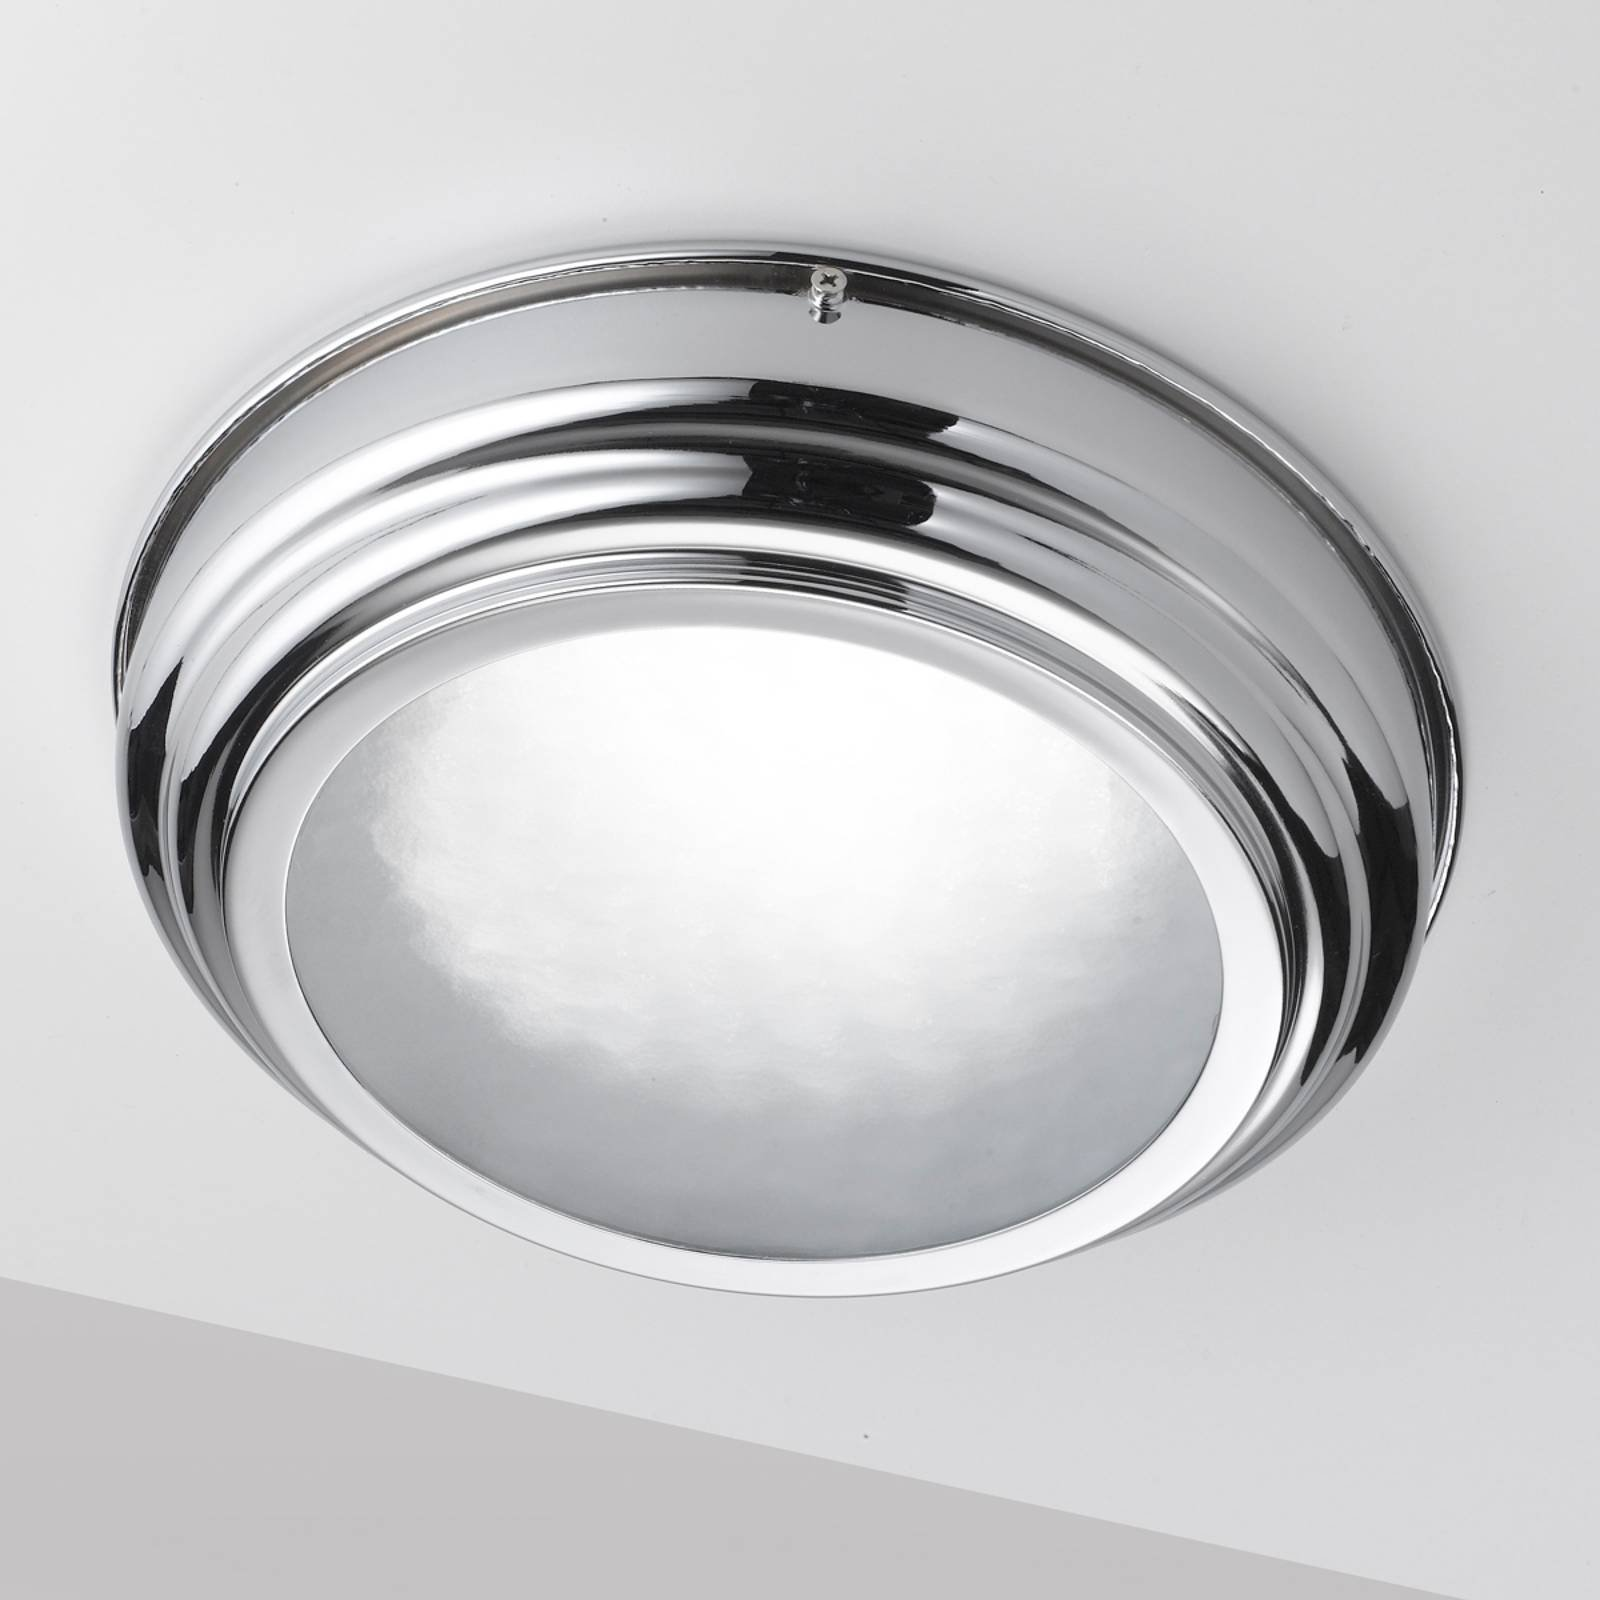 LED-taklampe med Scirocco 30 cm, krom blank